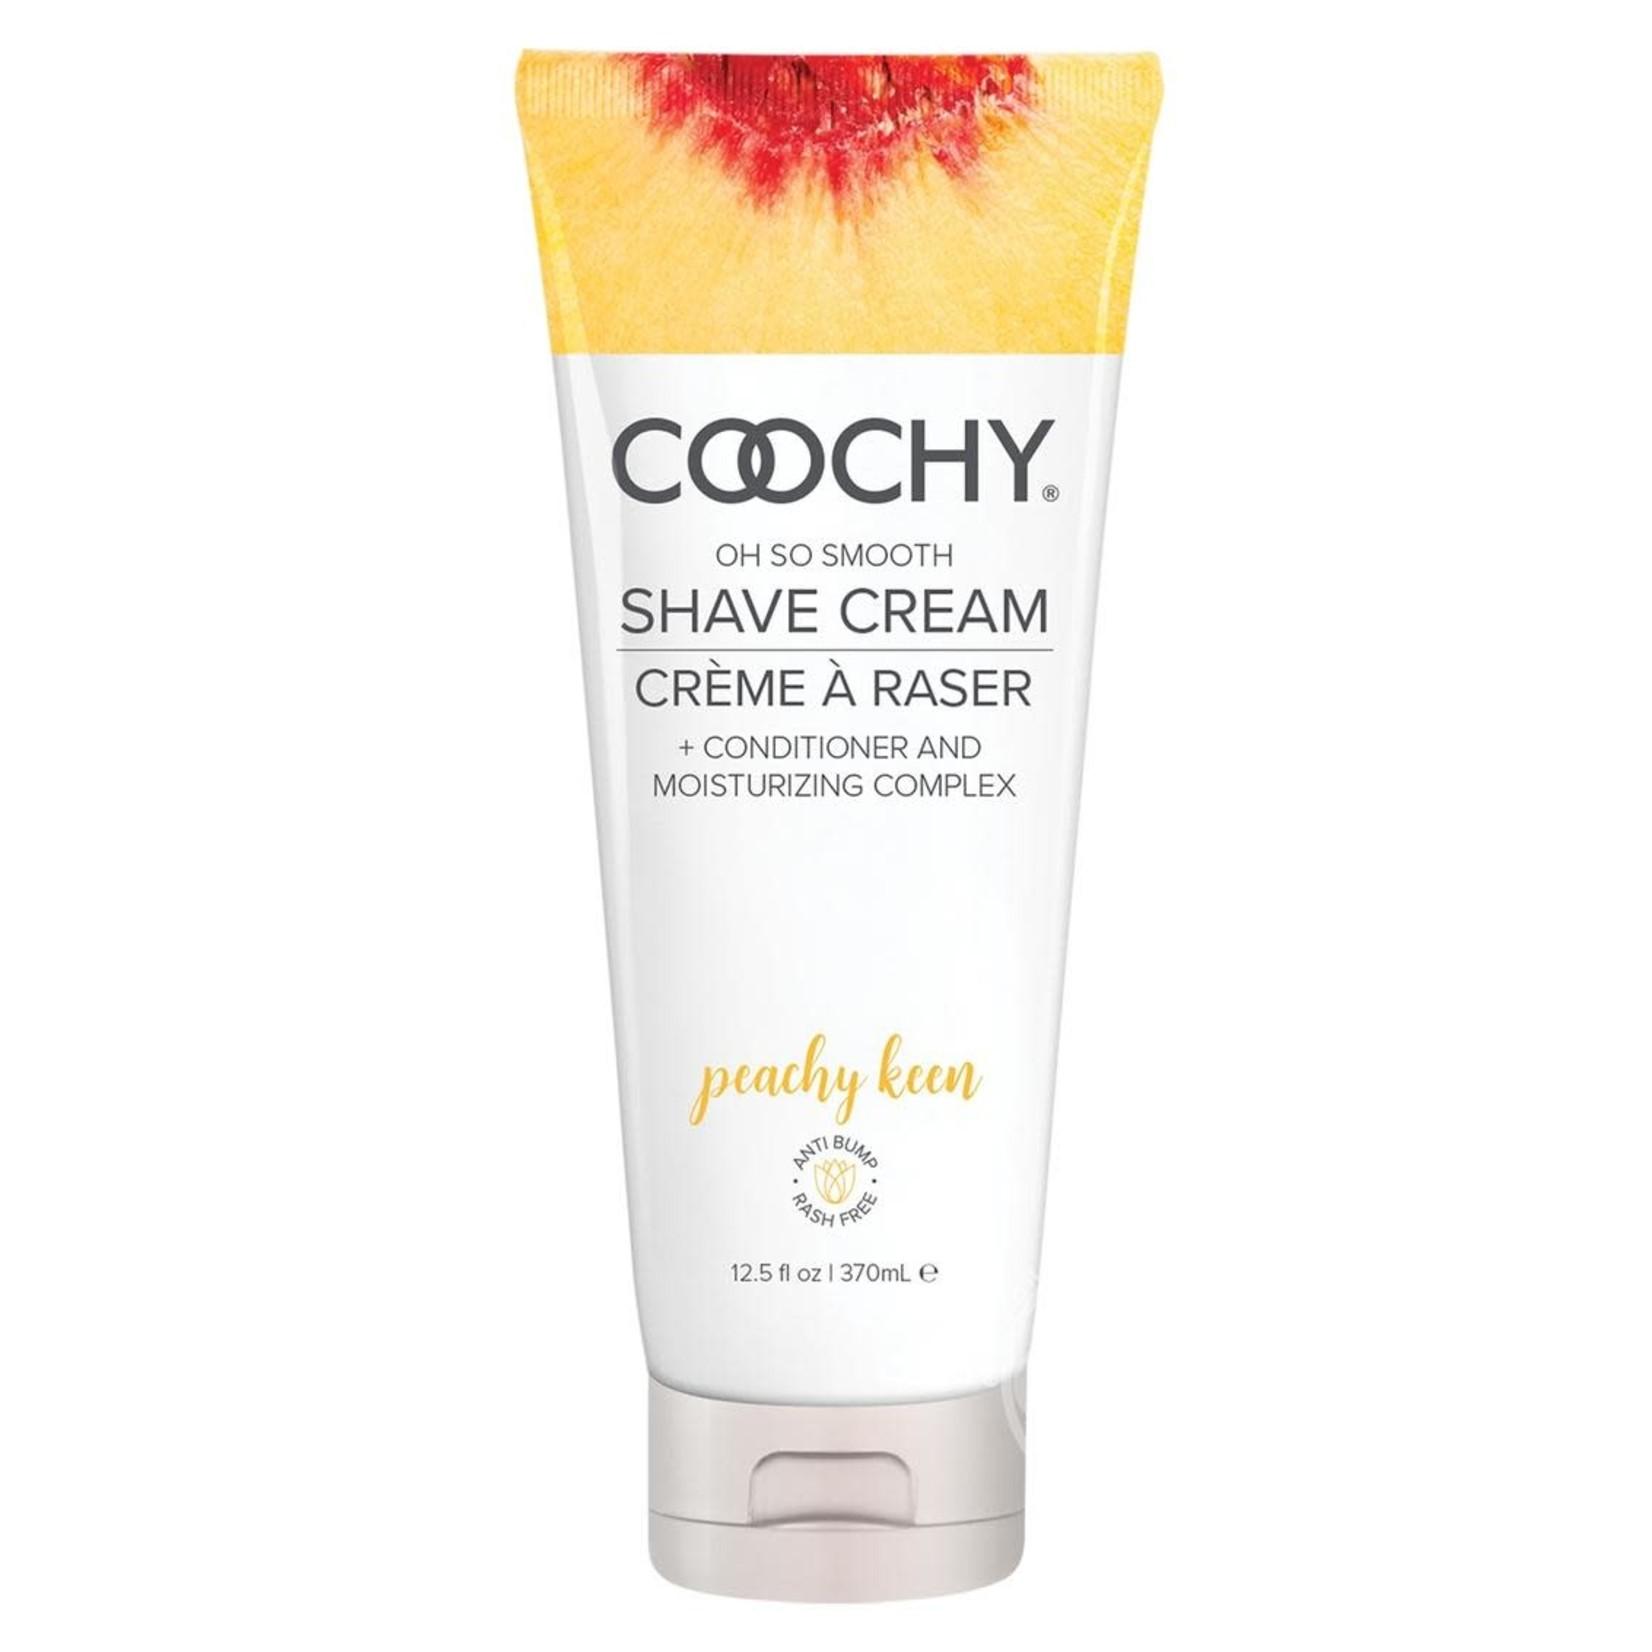 Coochy Shave Cream Peachy Keen 12.5oz